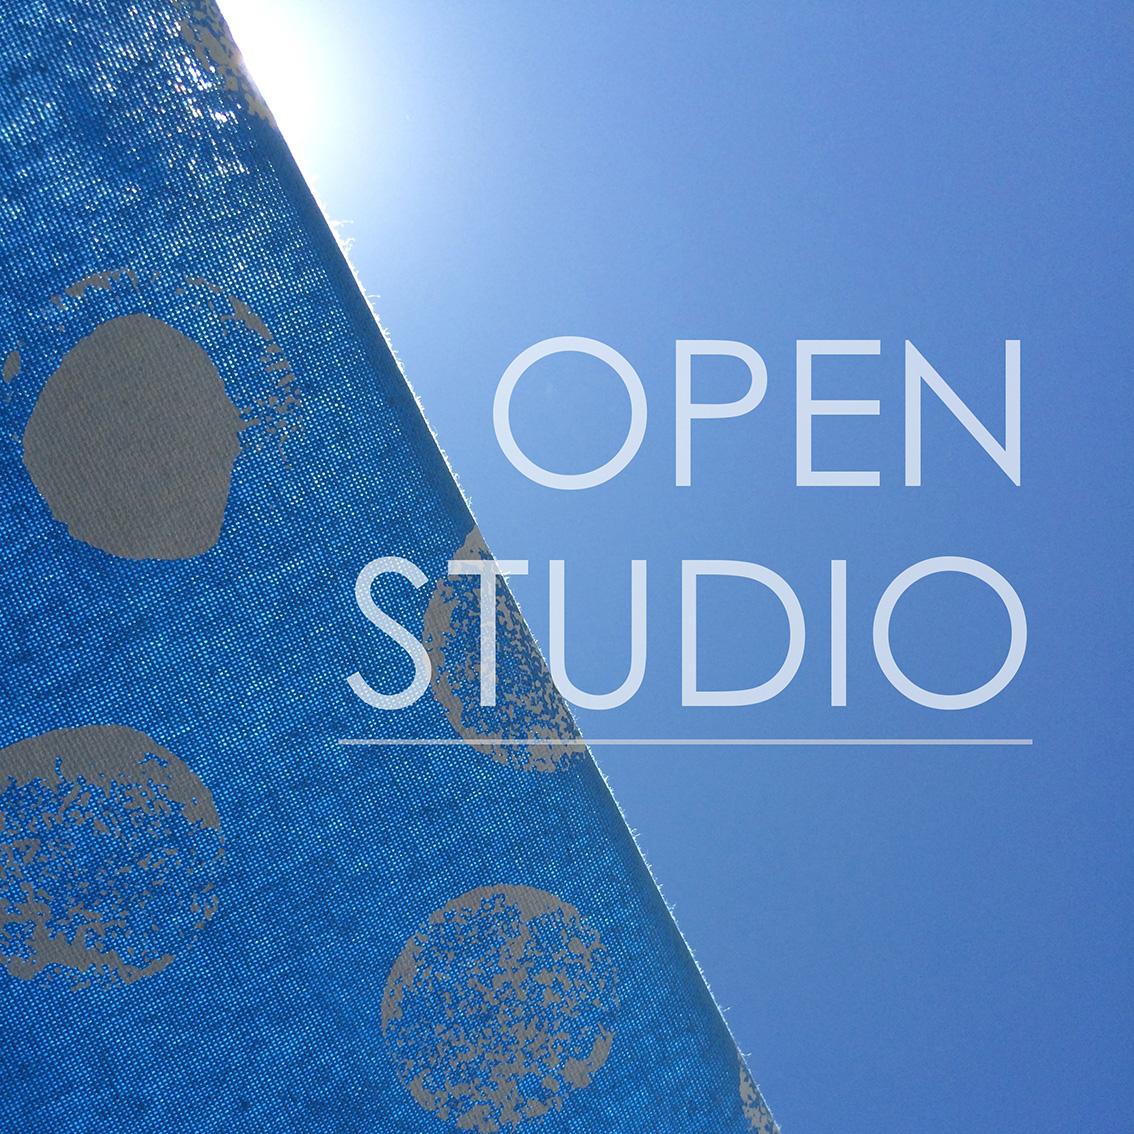 YOU ARE BRAVE - OPEN STUDIO.jpg